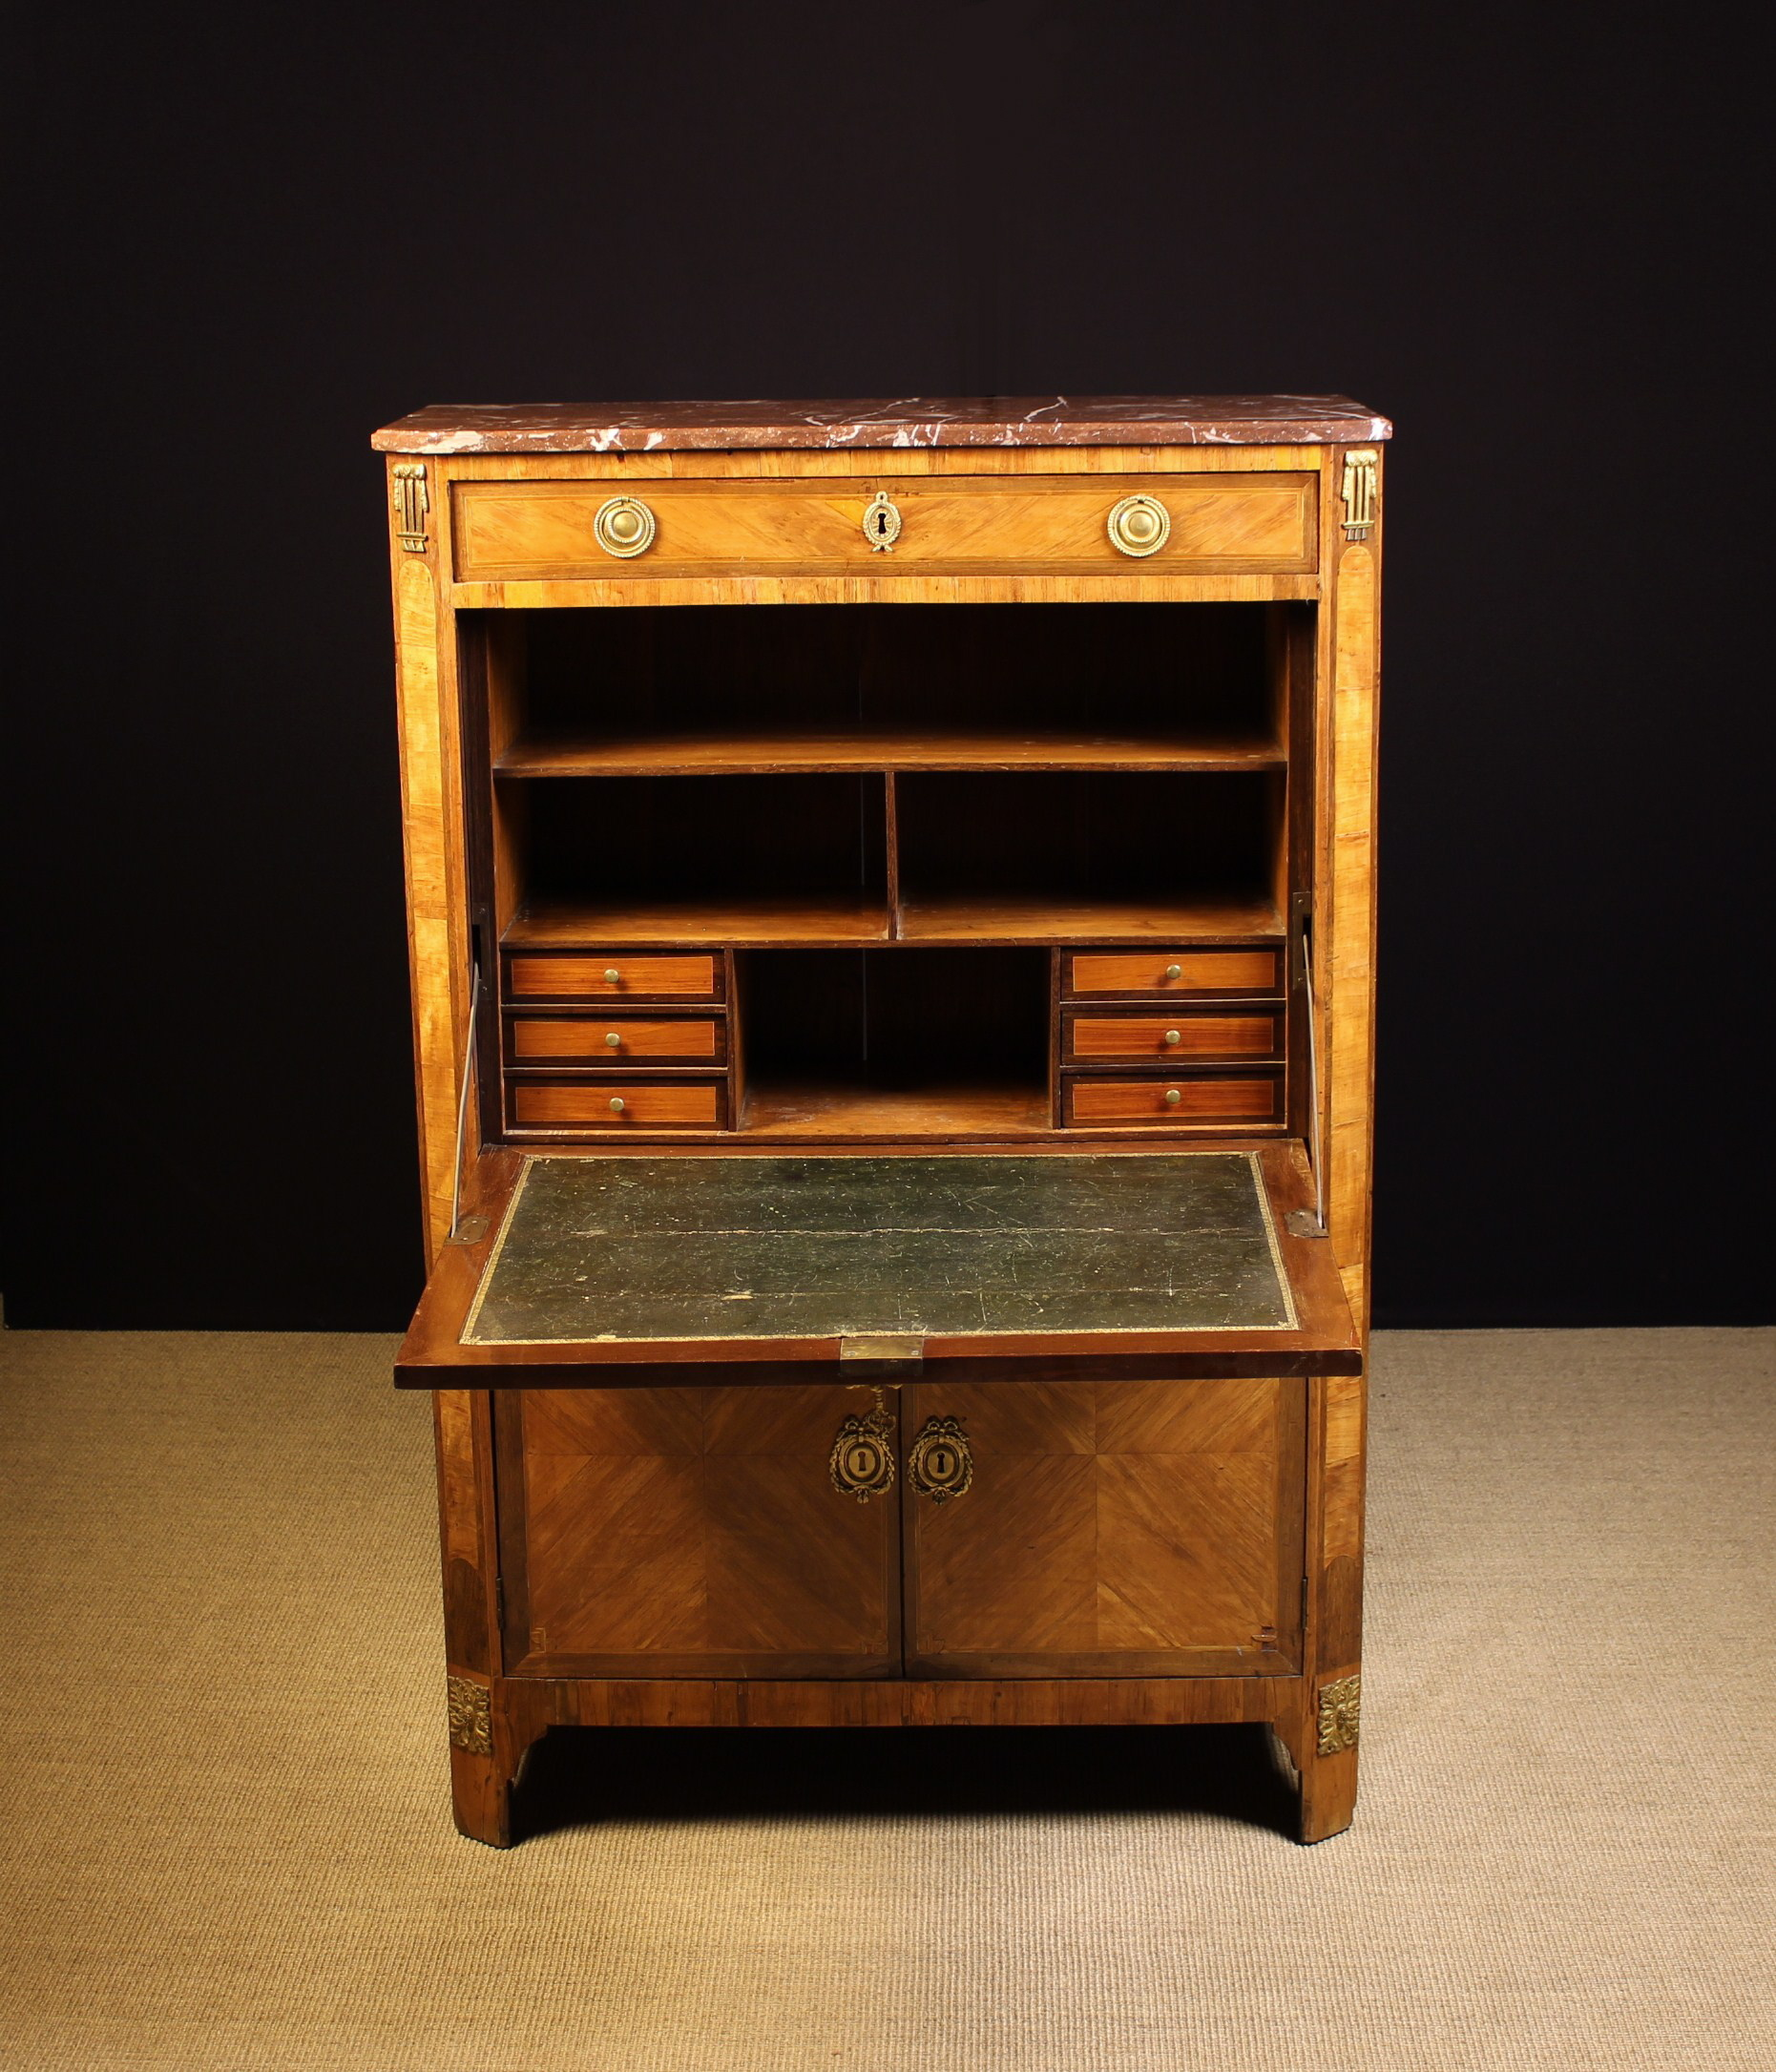 A 19th Century Continental Tulipwood Veneered Escritoire. - Image 4 of 4